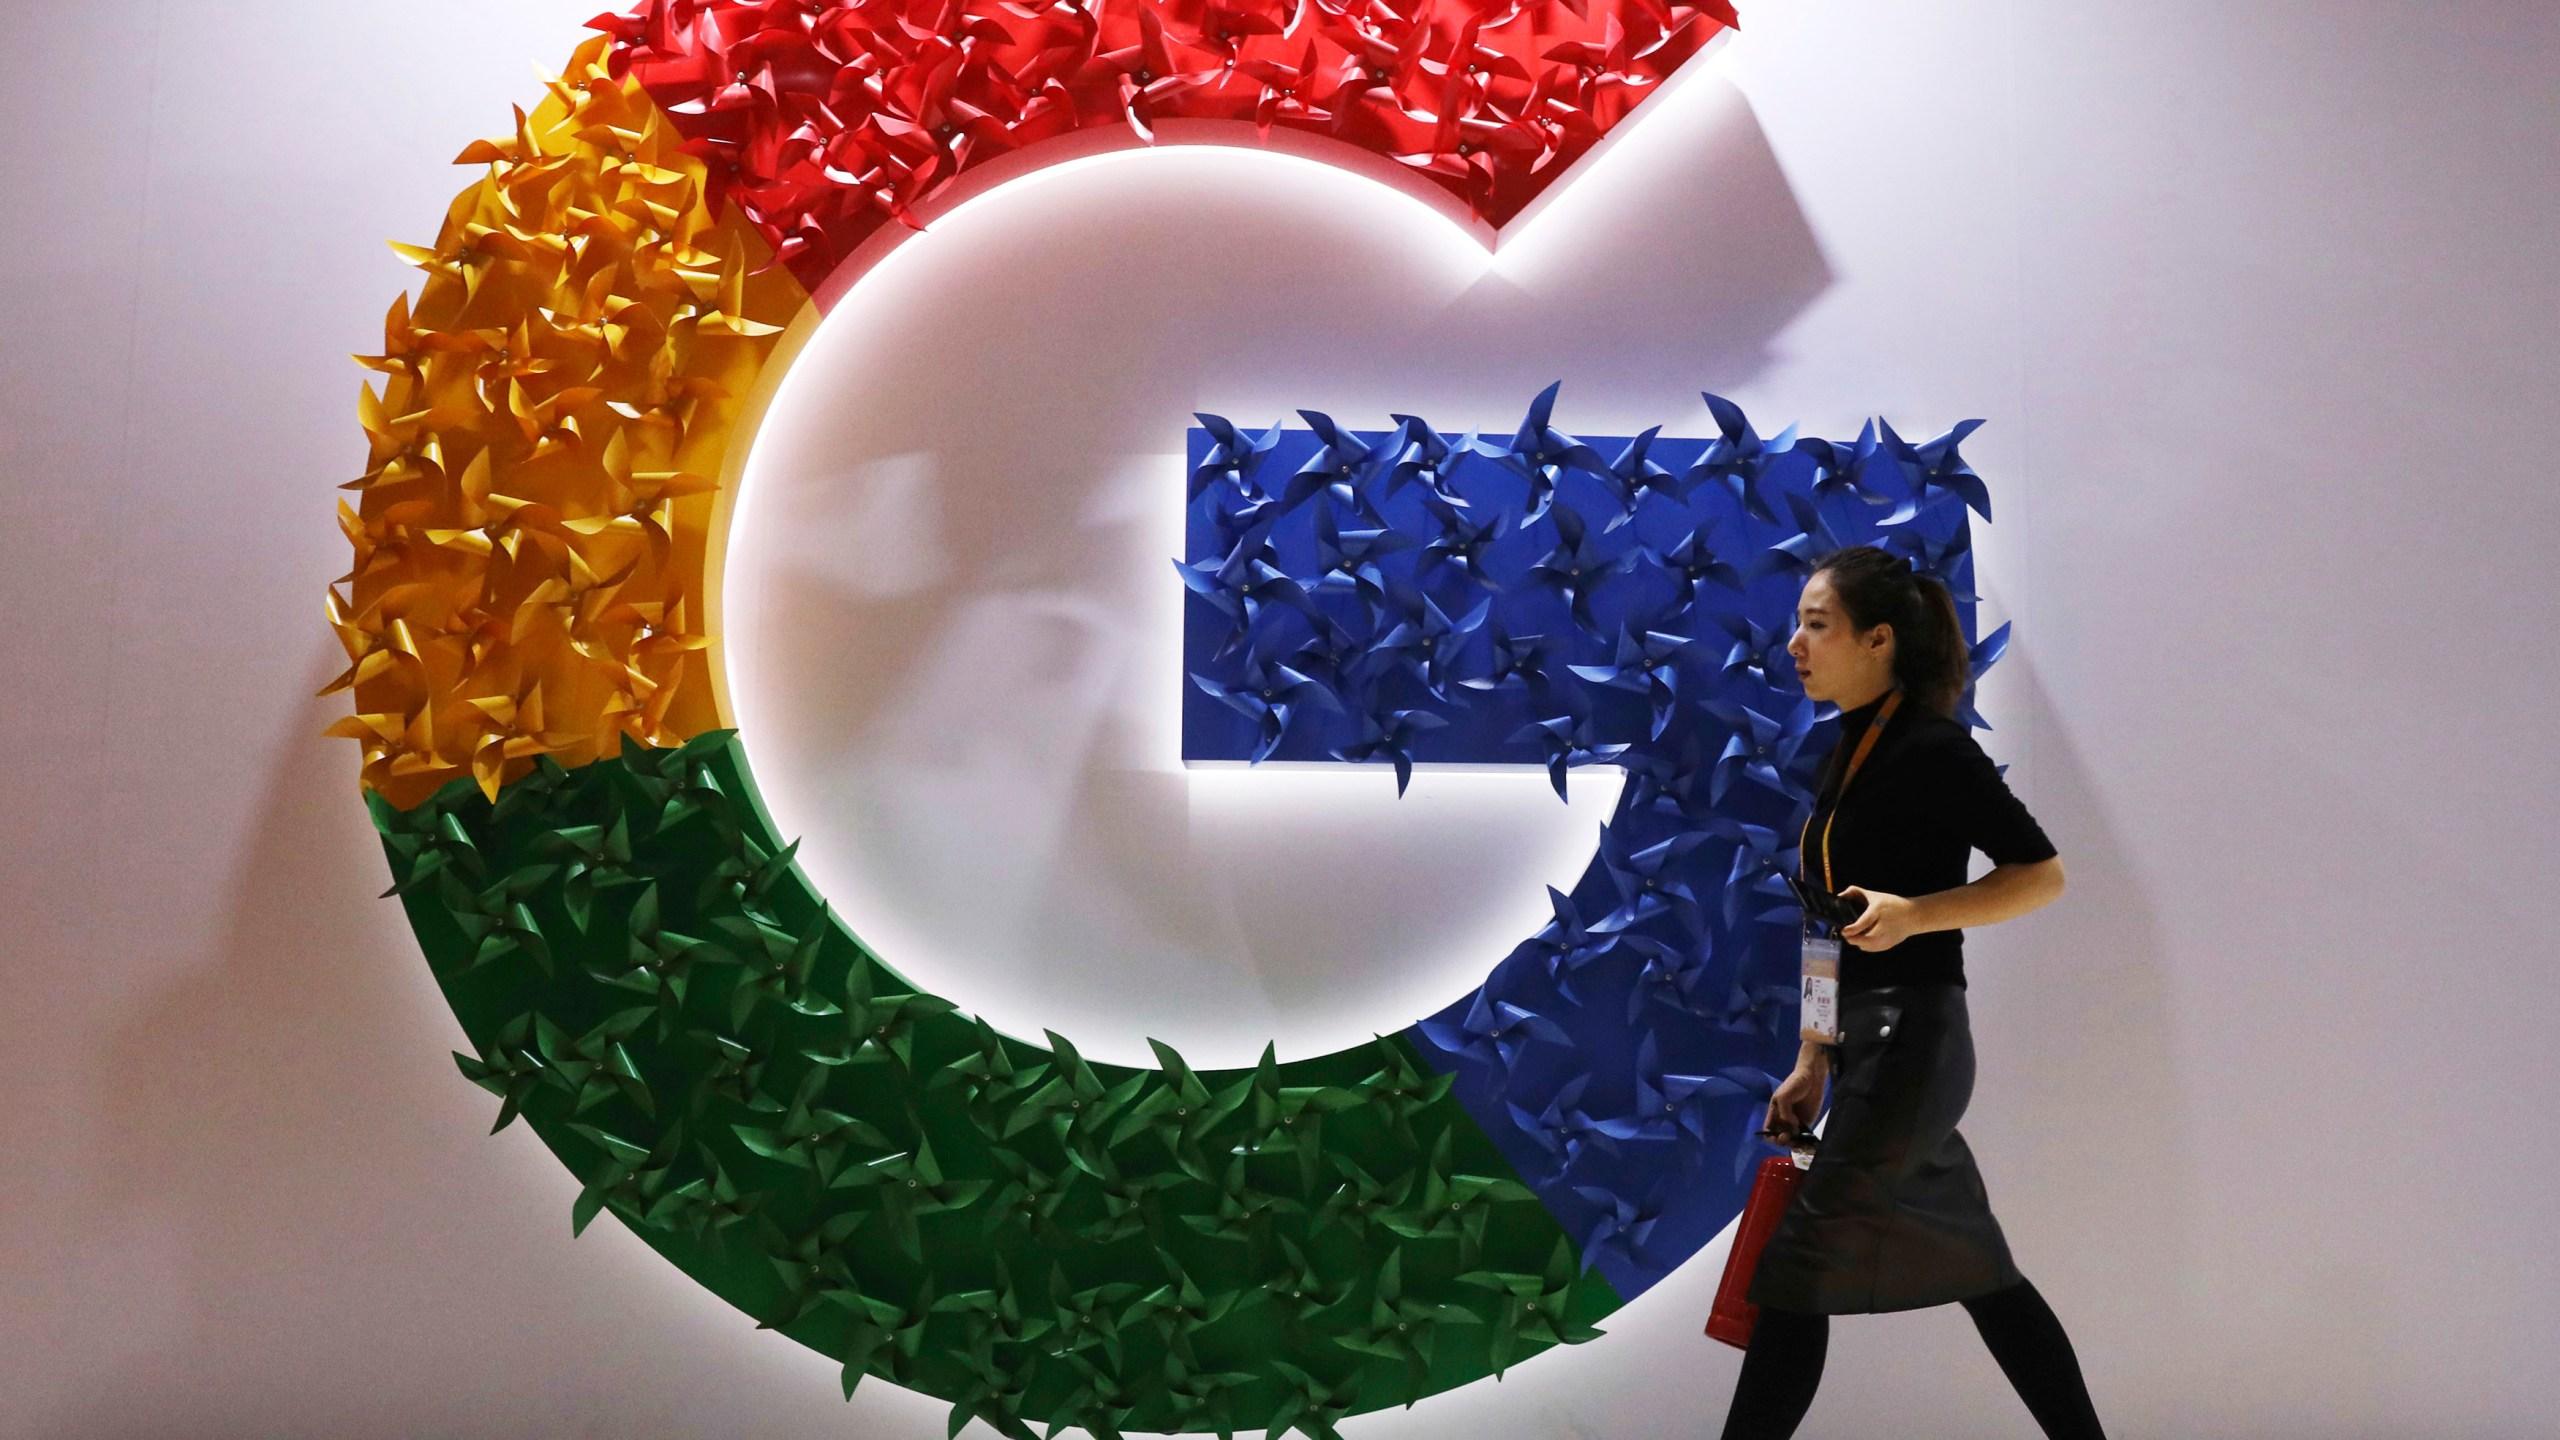 A woman walks past the logo for Google at the China International Import Expo in Shanghai. on Monday, Nov. 5, 2018. (AP Photo/Ng Han Guan, File)